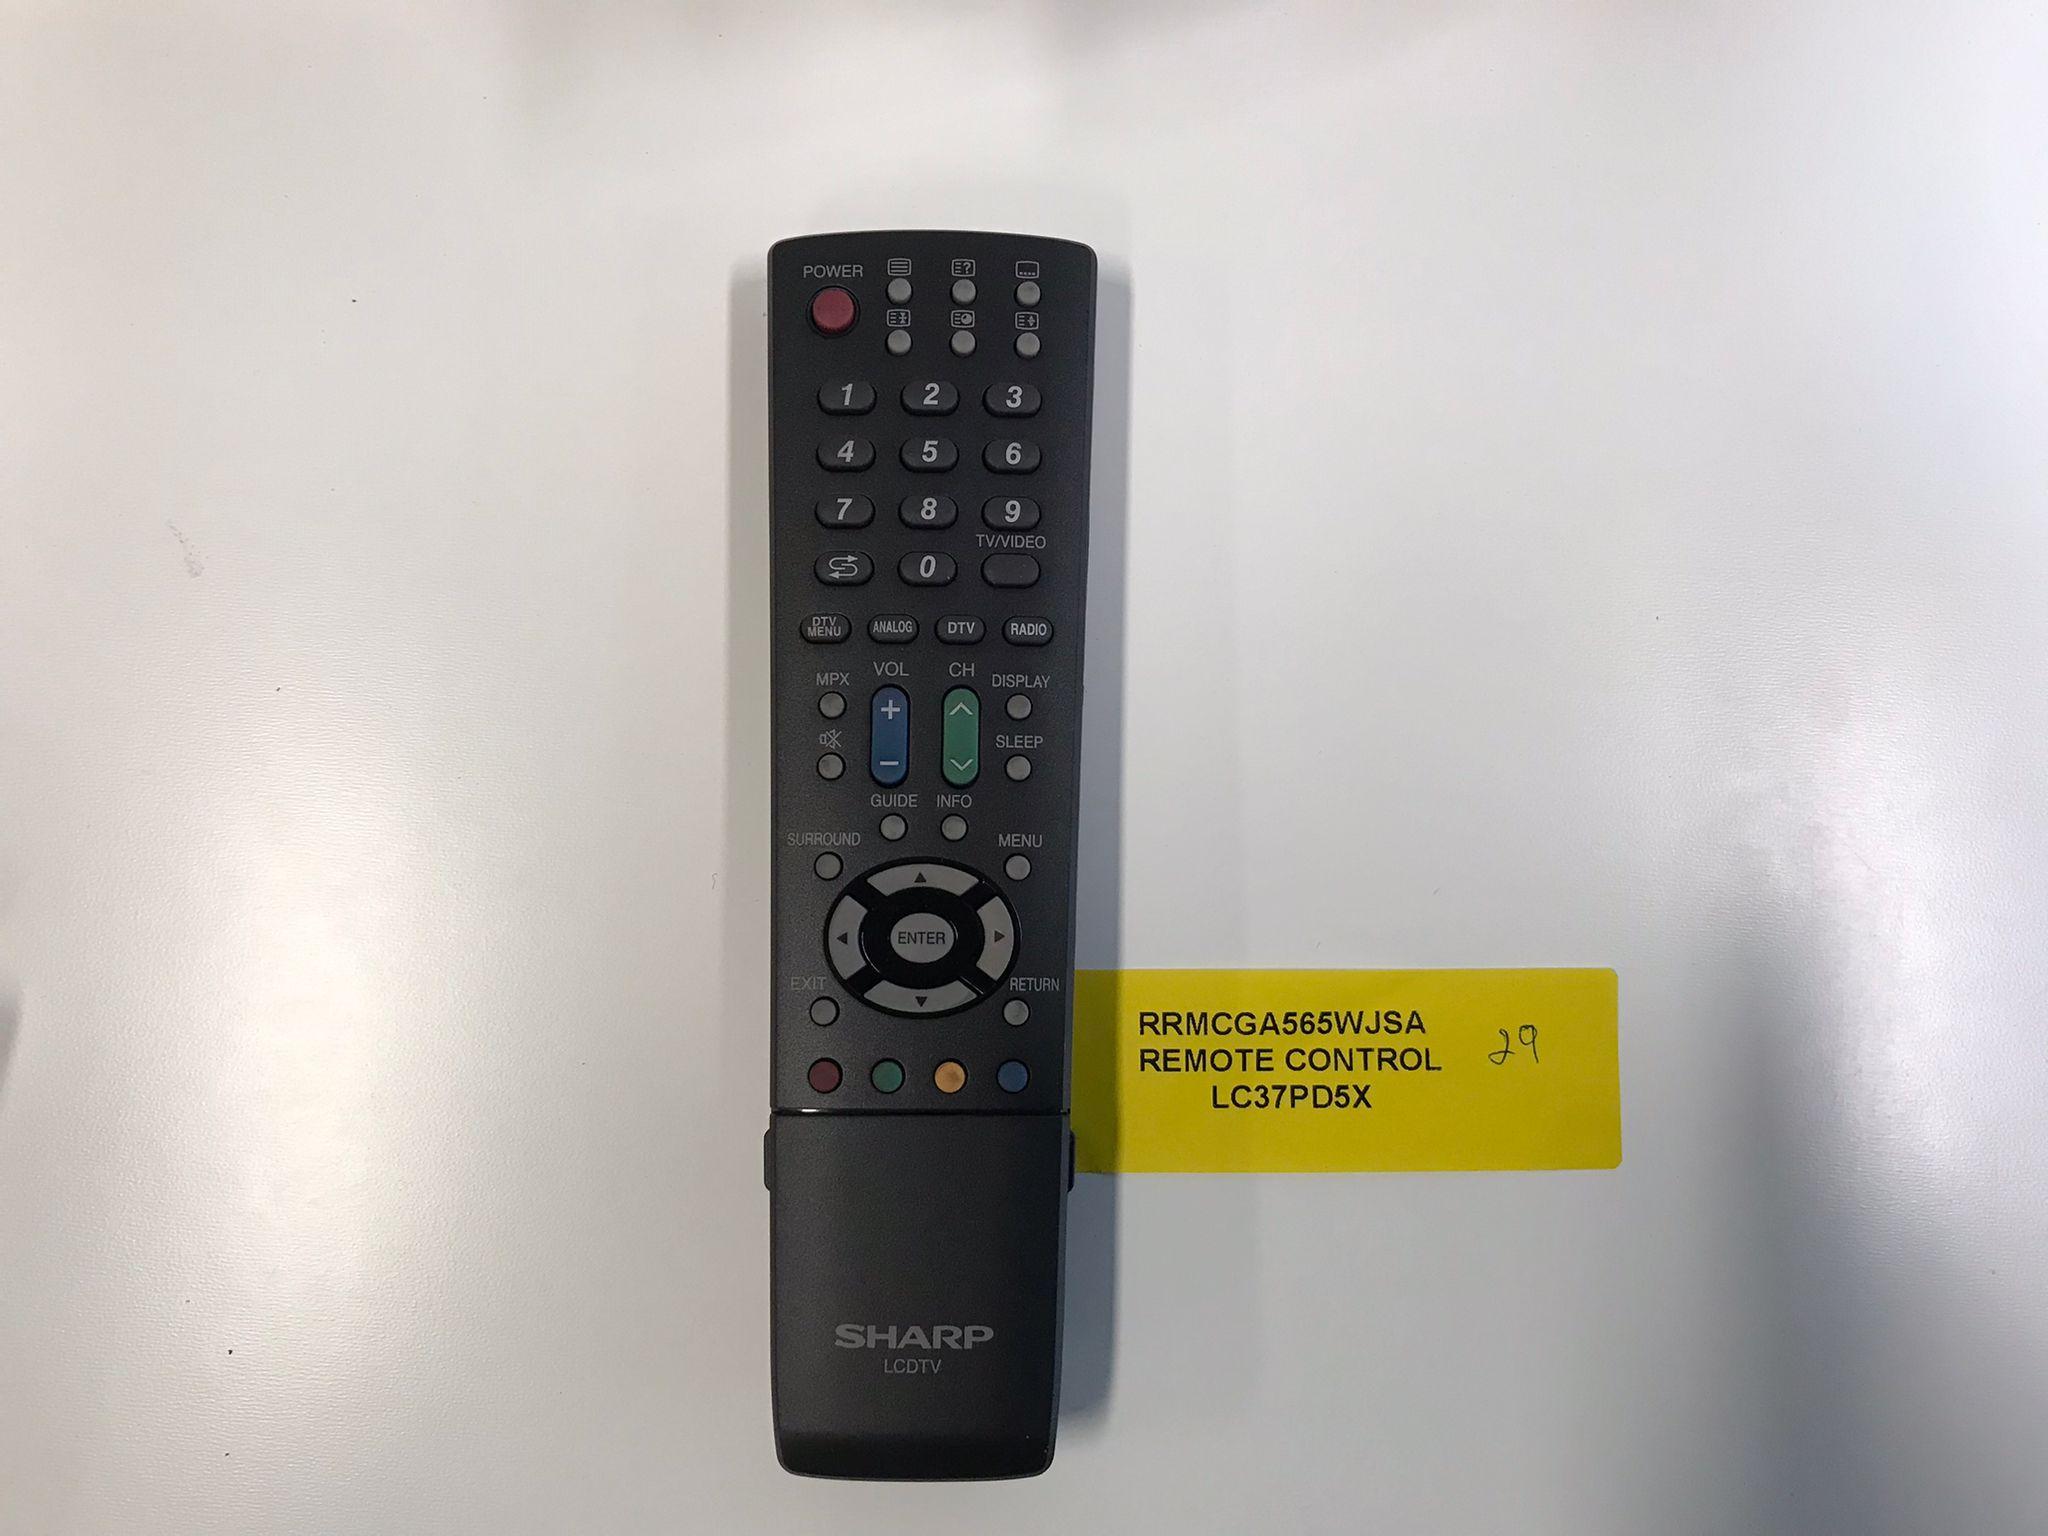 Sharp TV Remote Control RRMCGA565WJSA